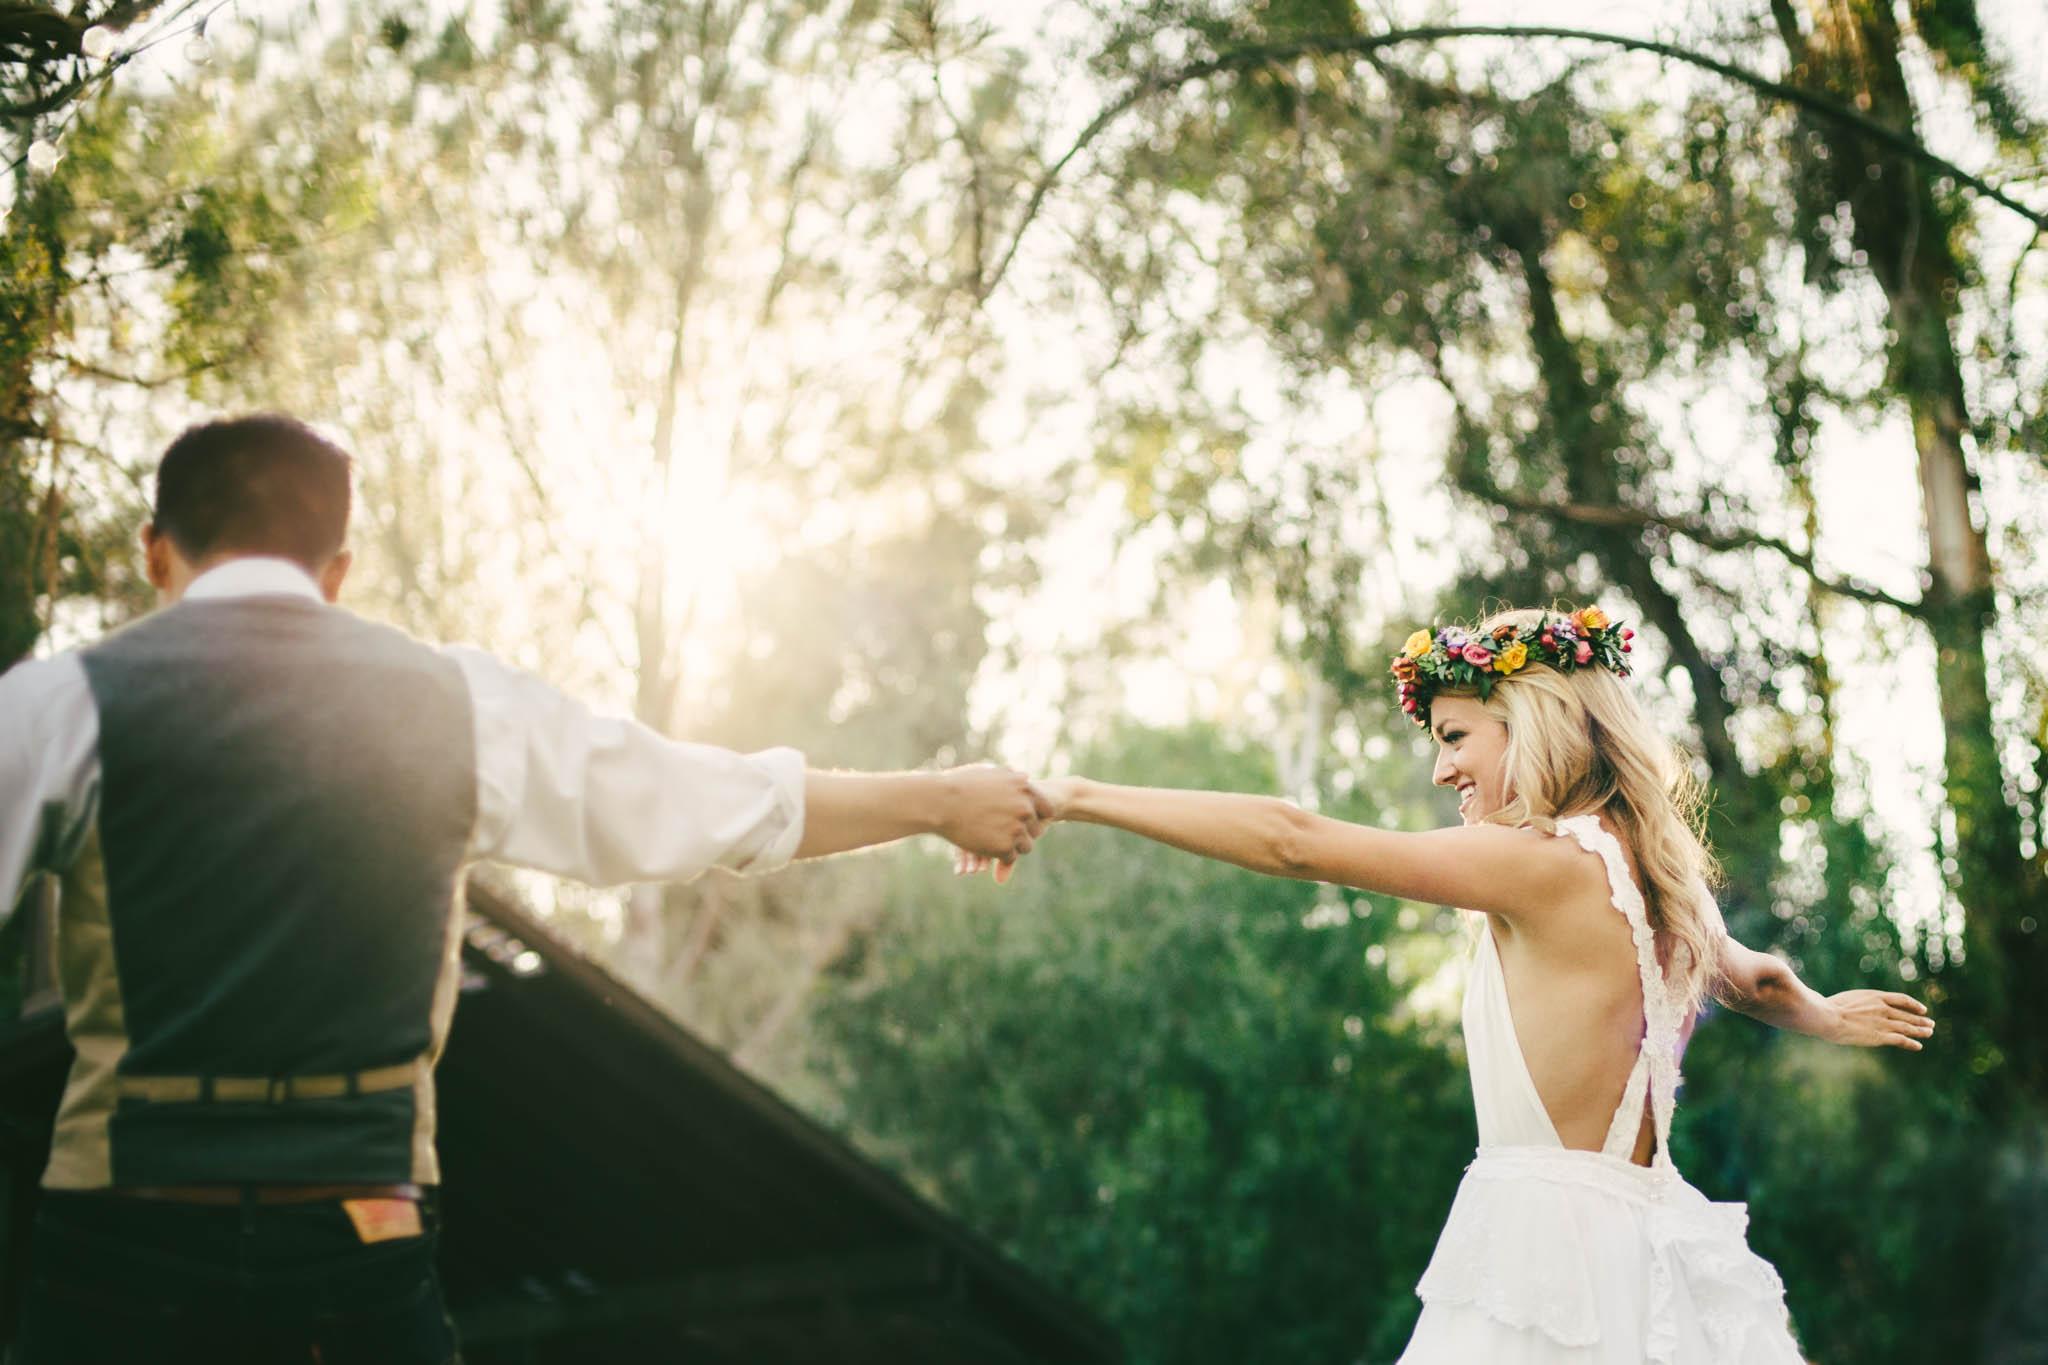 ©Isaiah & Taylor Photography - Los Angeles Wedding Photographer - Mexican Bohemian Wedding, Laguna Niguel Regional Park, Orange County-43.jpg